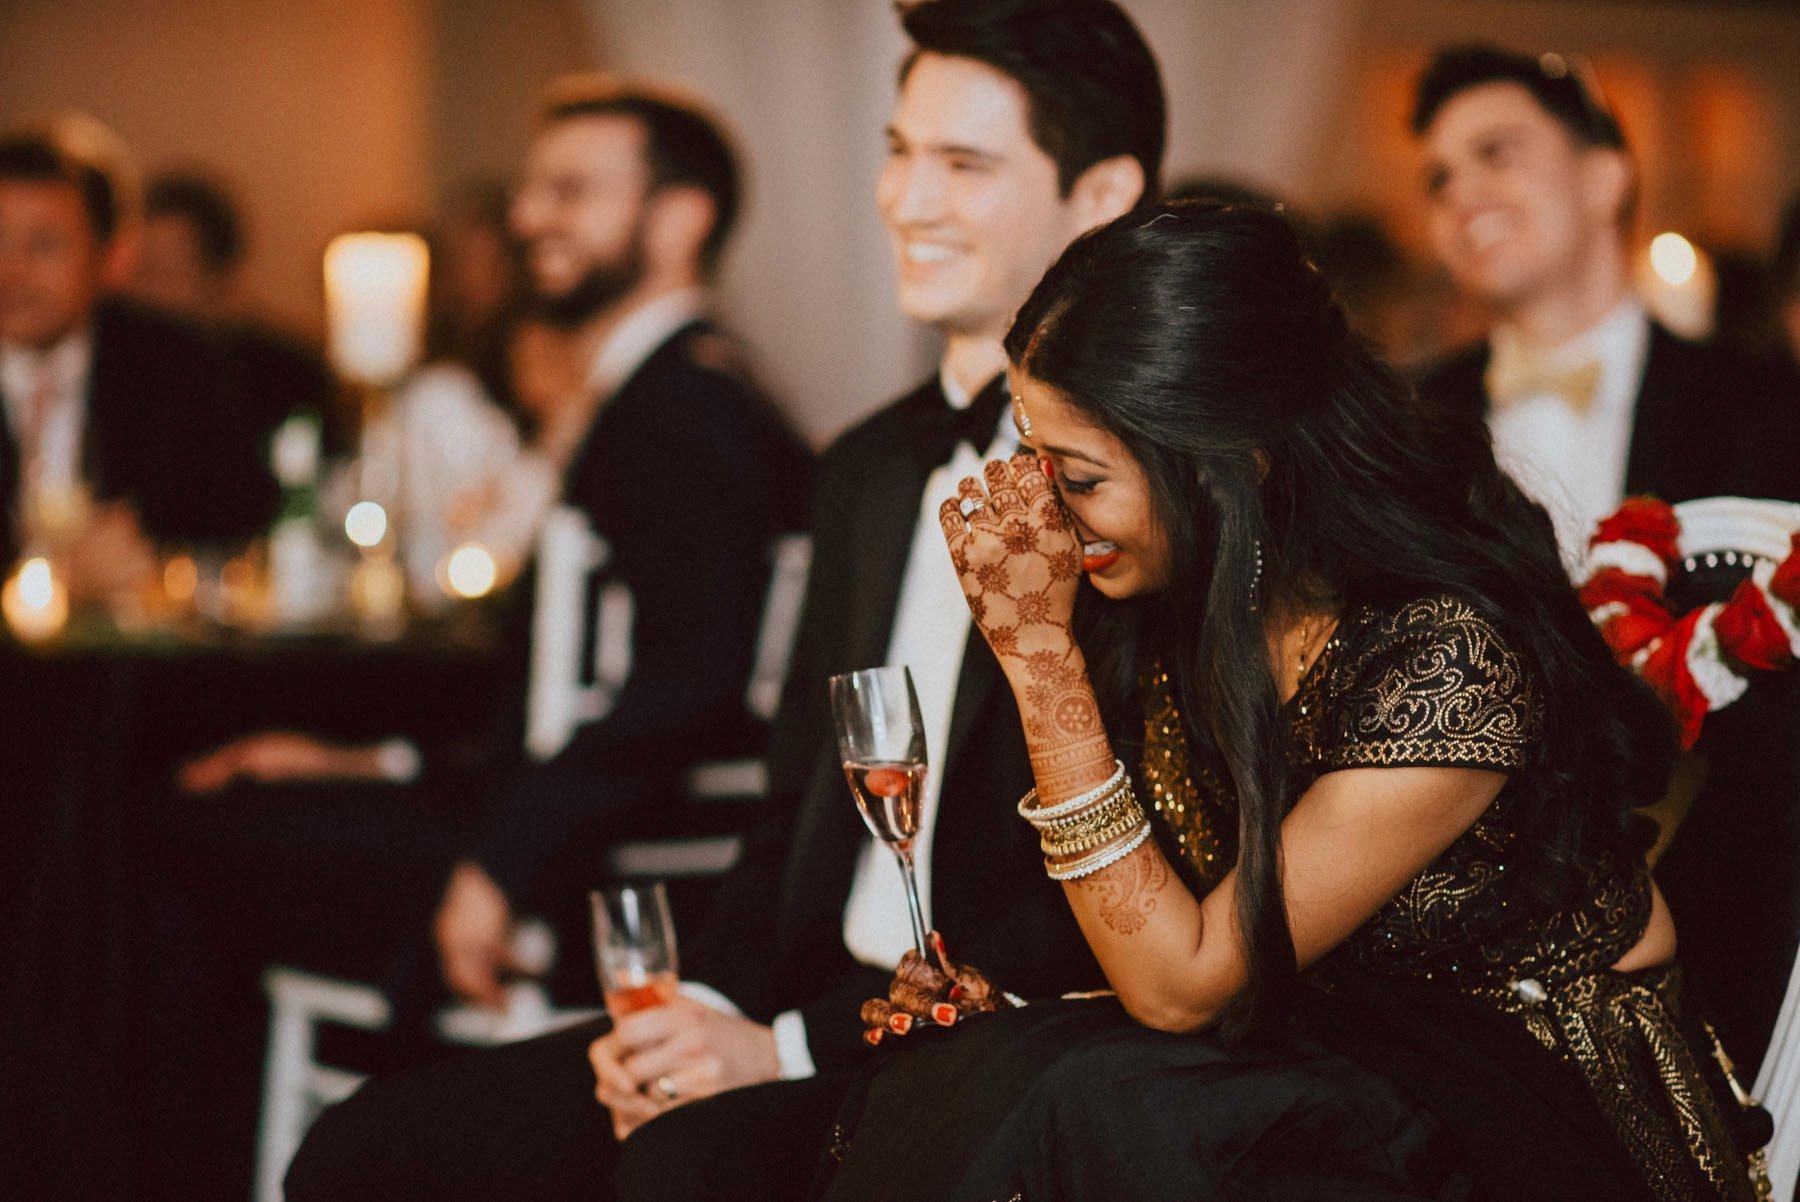 vie-philadelphia-indian-wedding-114.jpg